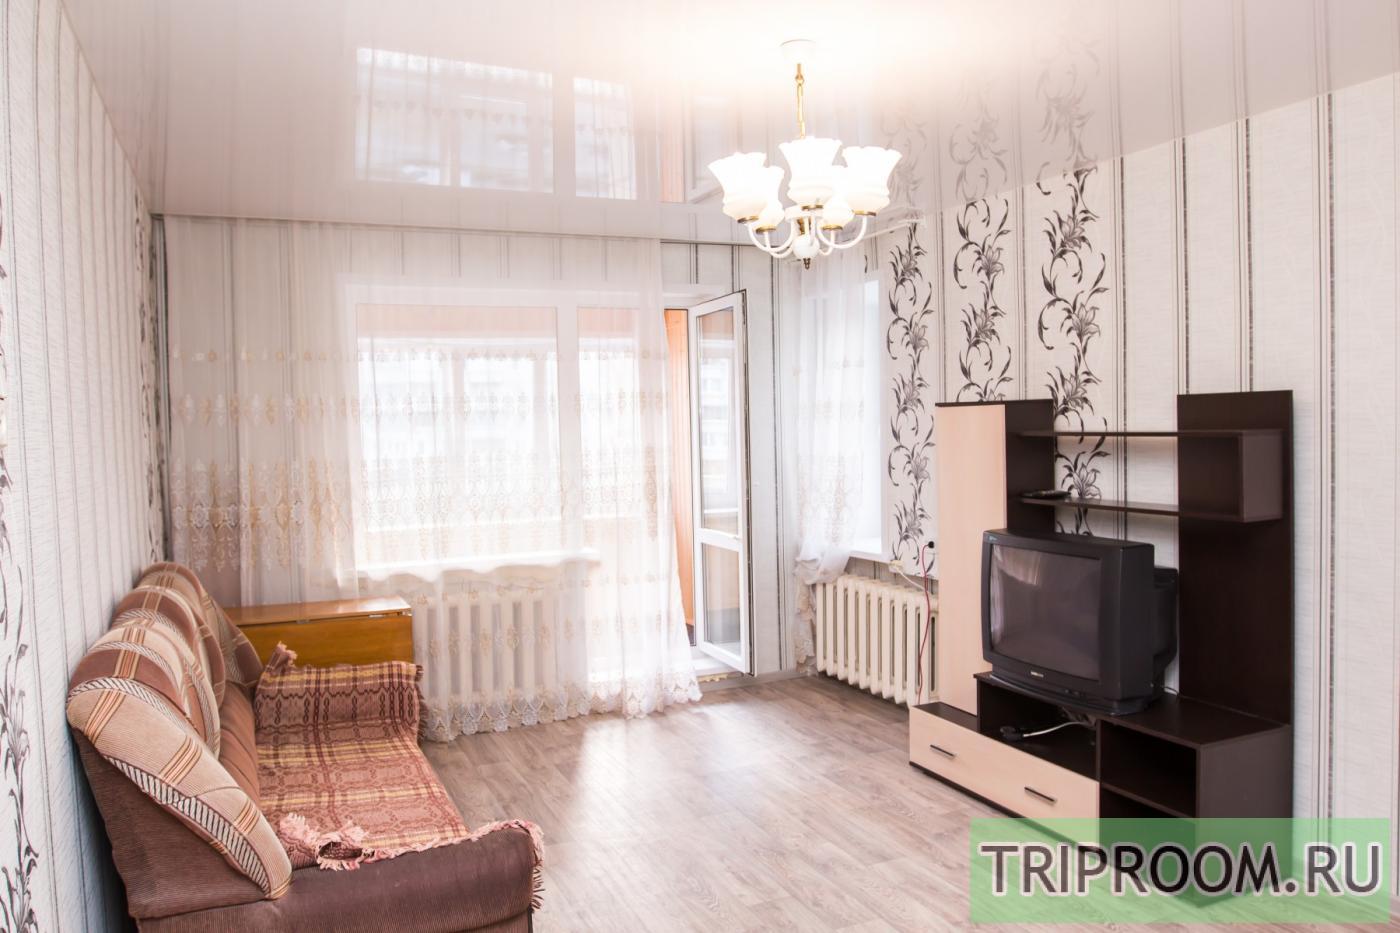 1-комнатная квартира посуточно (вариант № 19637), ул. Ульяновский пр-кт, фото № 1